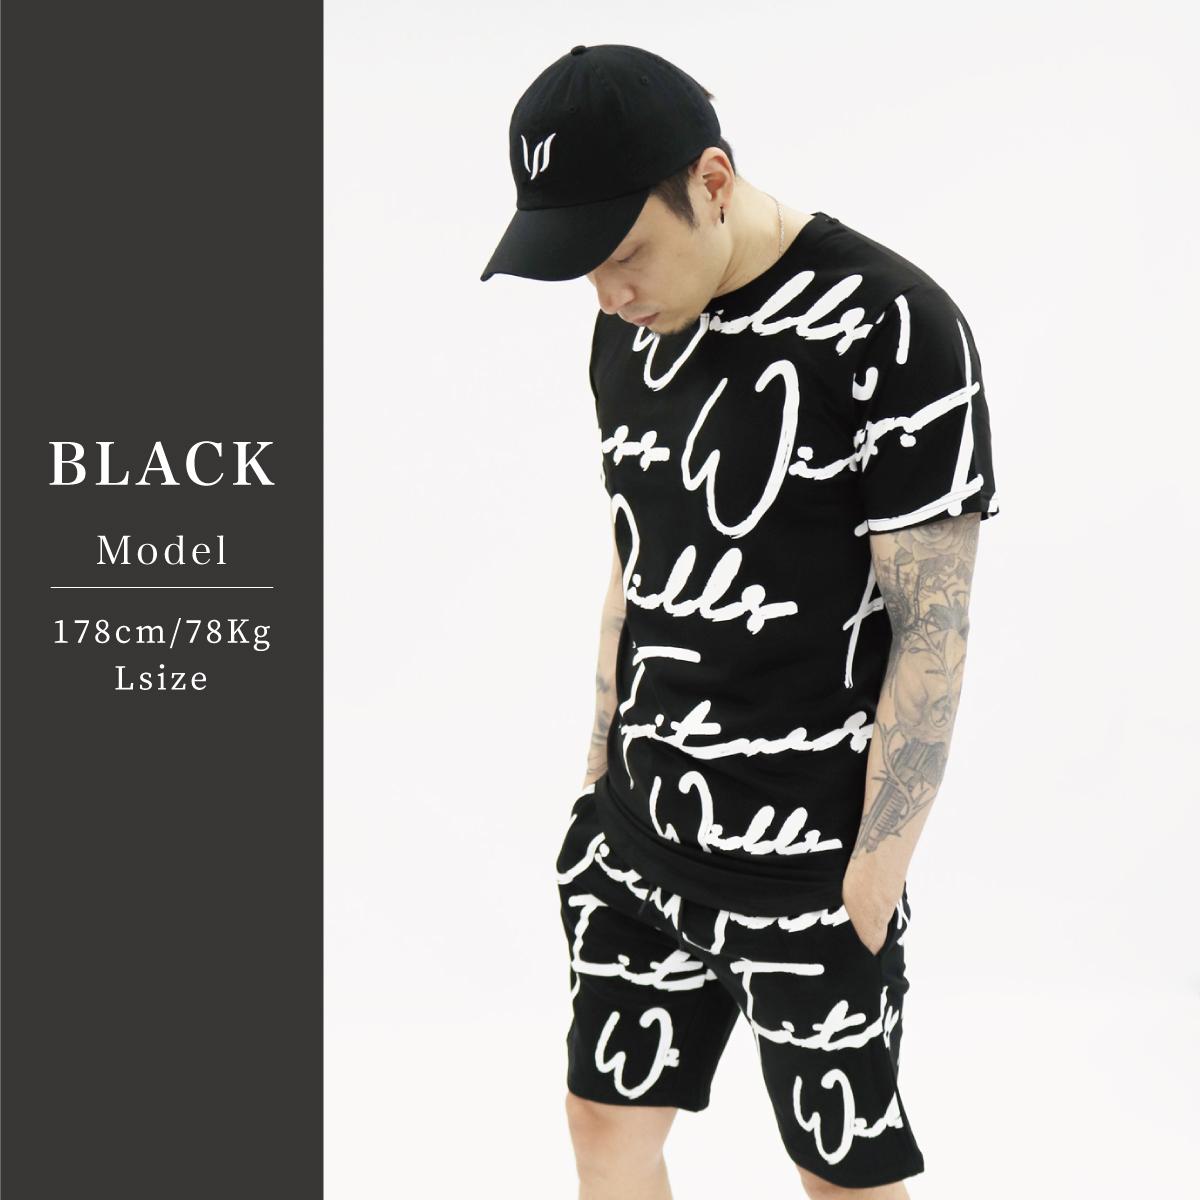 SCRIPT SHORTS - BLACK